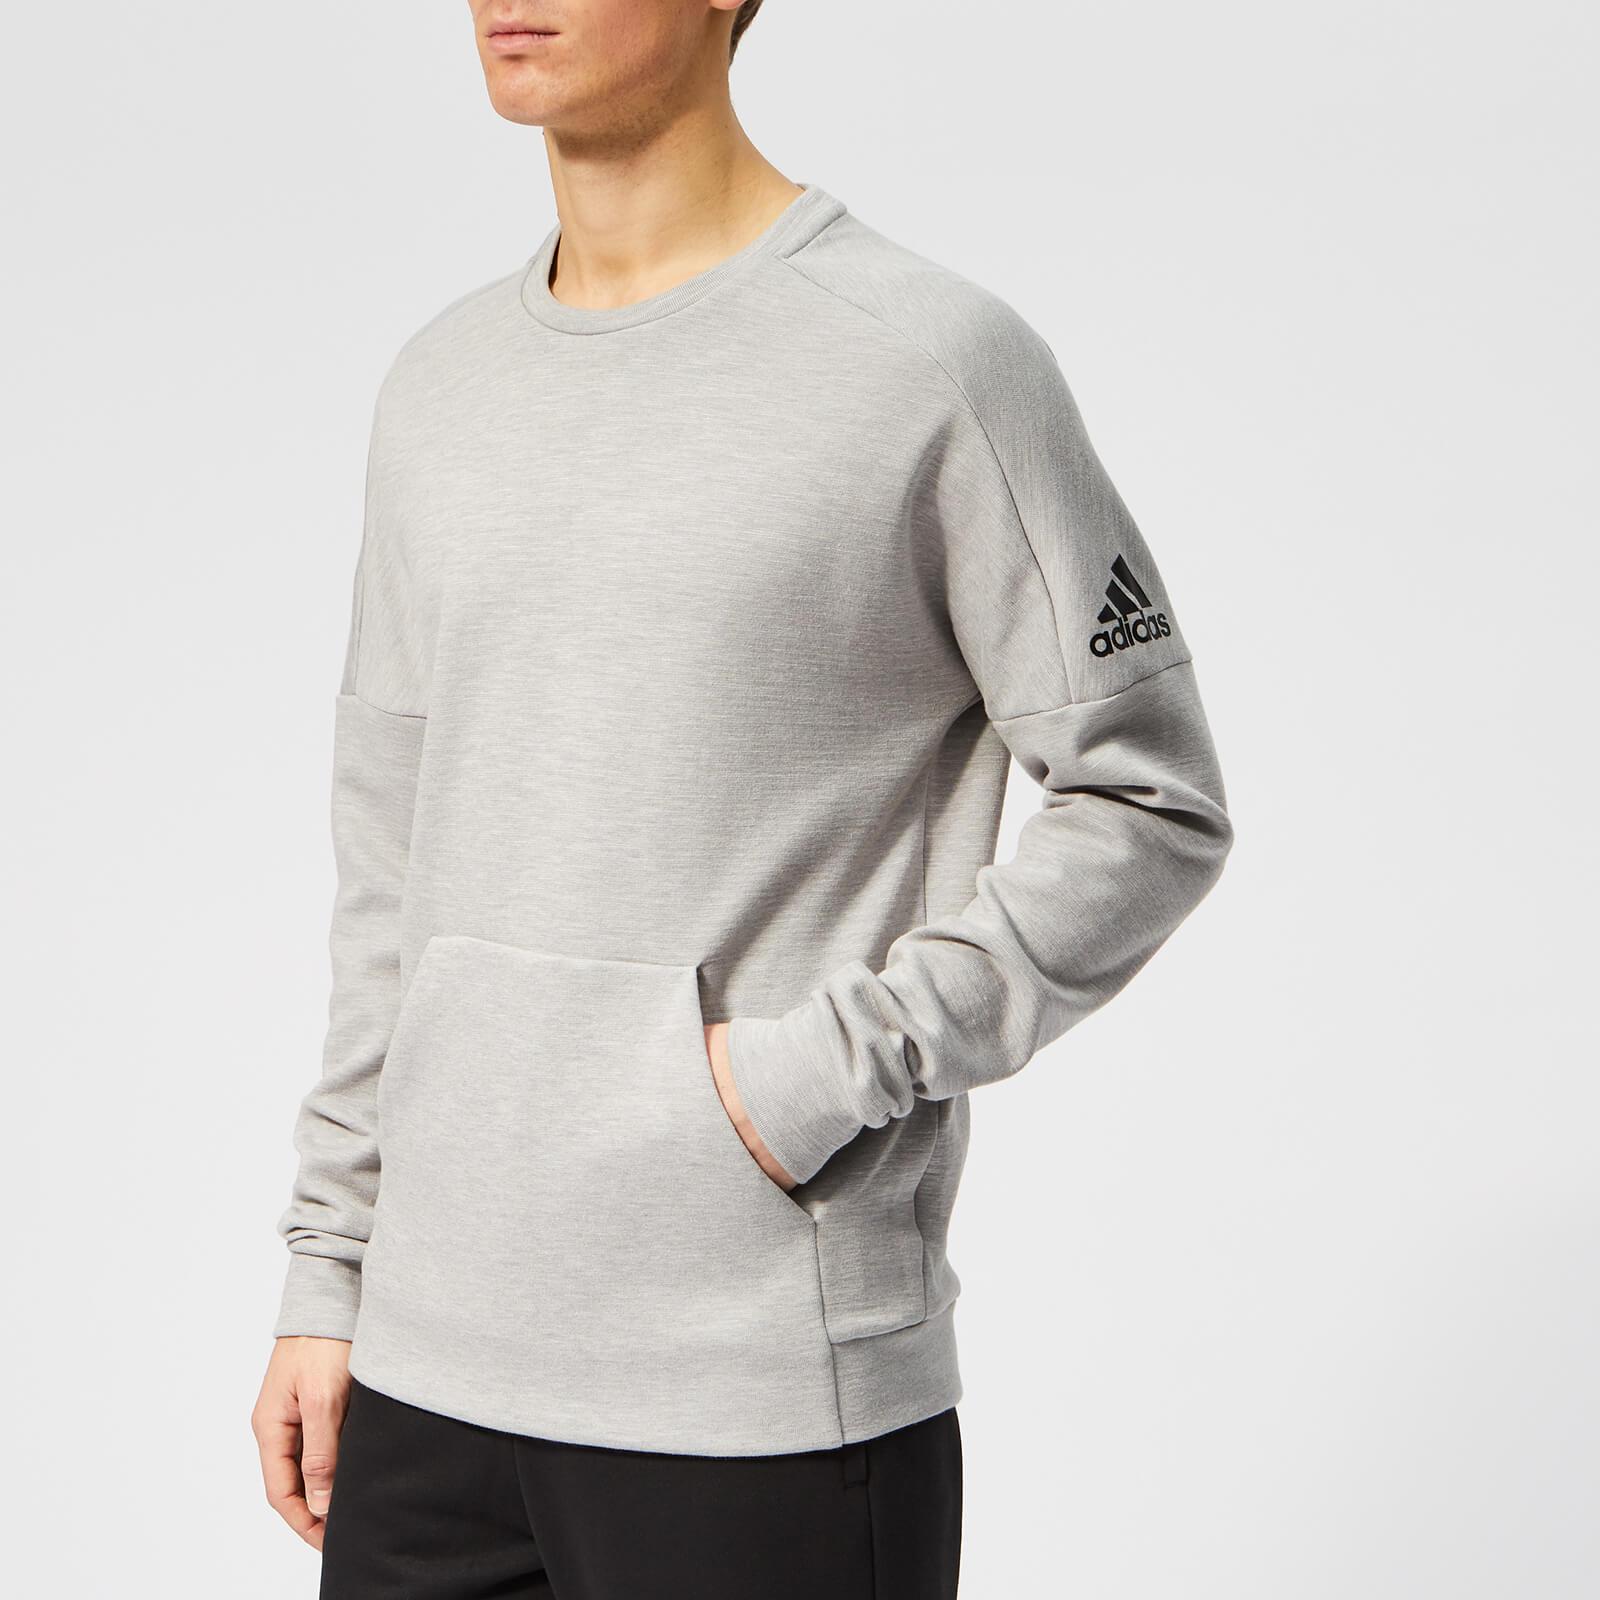 adidas Men's ID Stadium Crew Neck Sweatshirt - Grey Heather - XXL - Grey